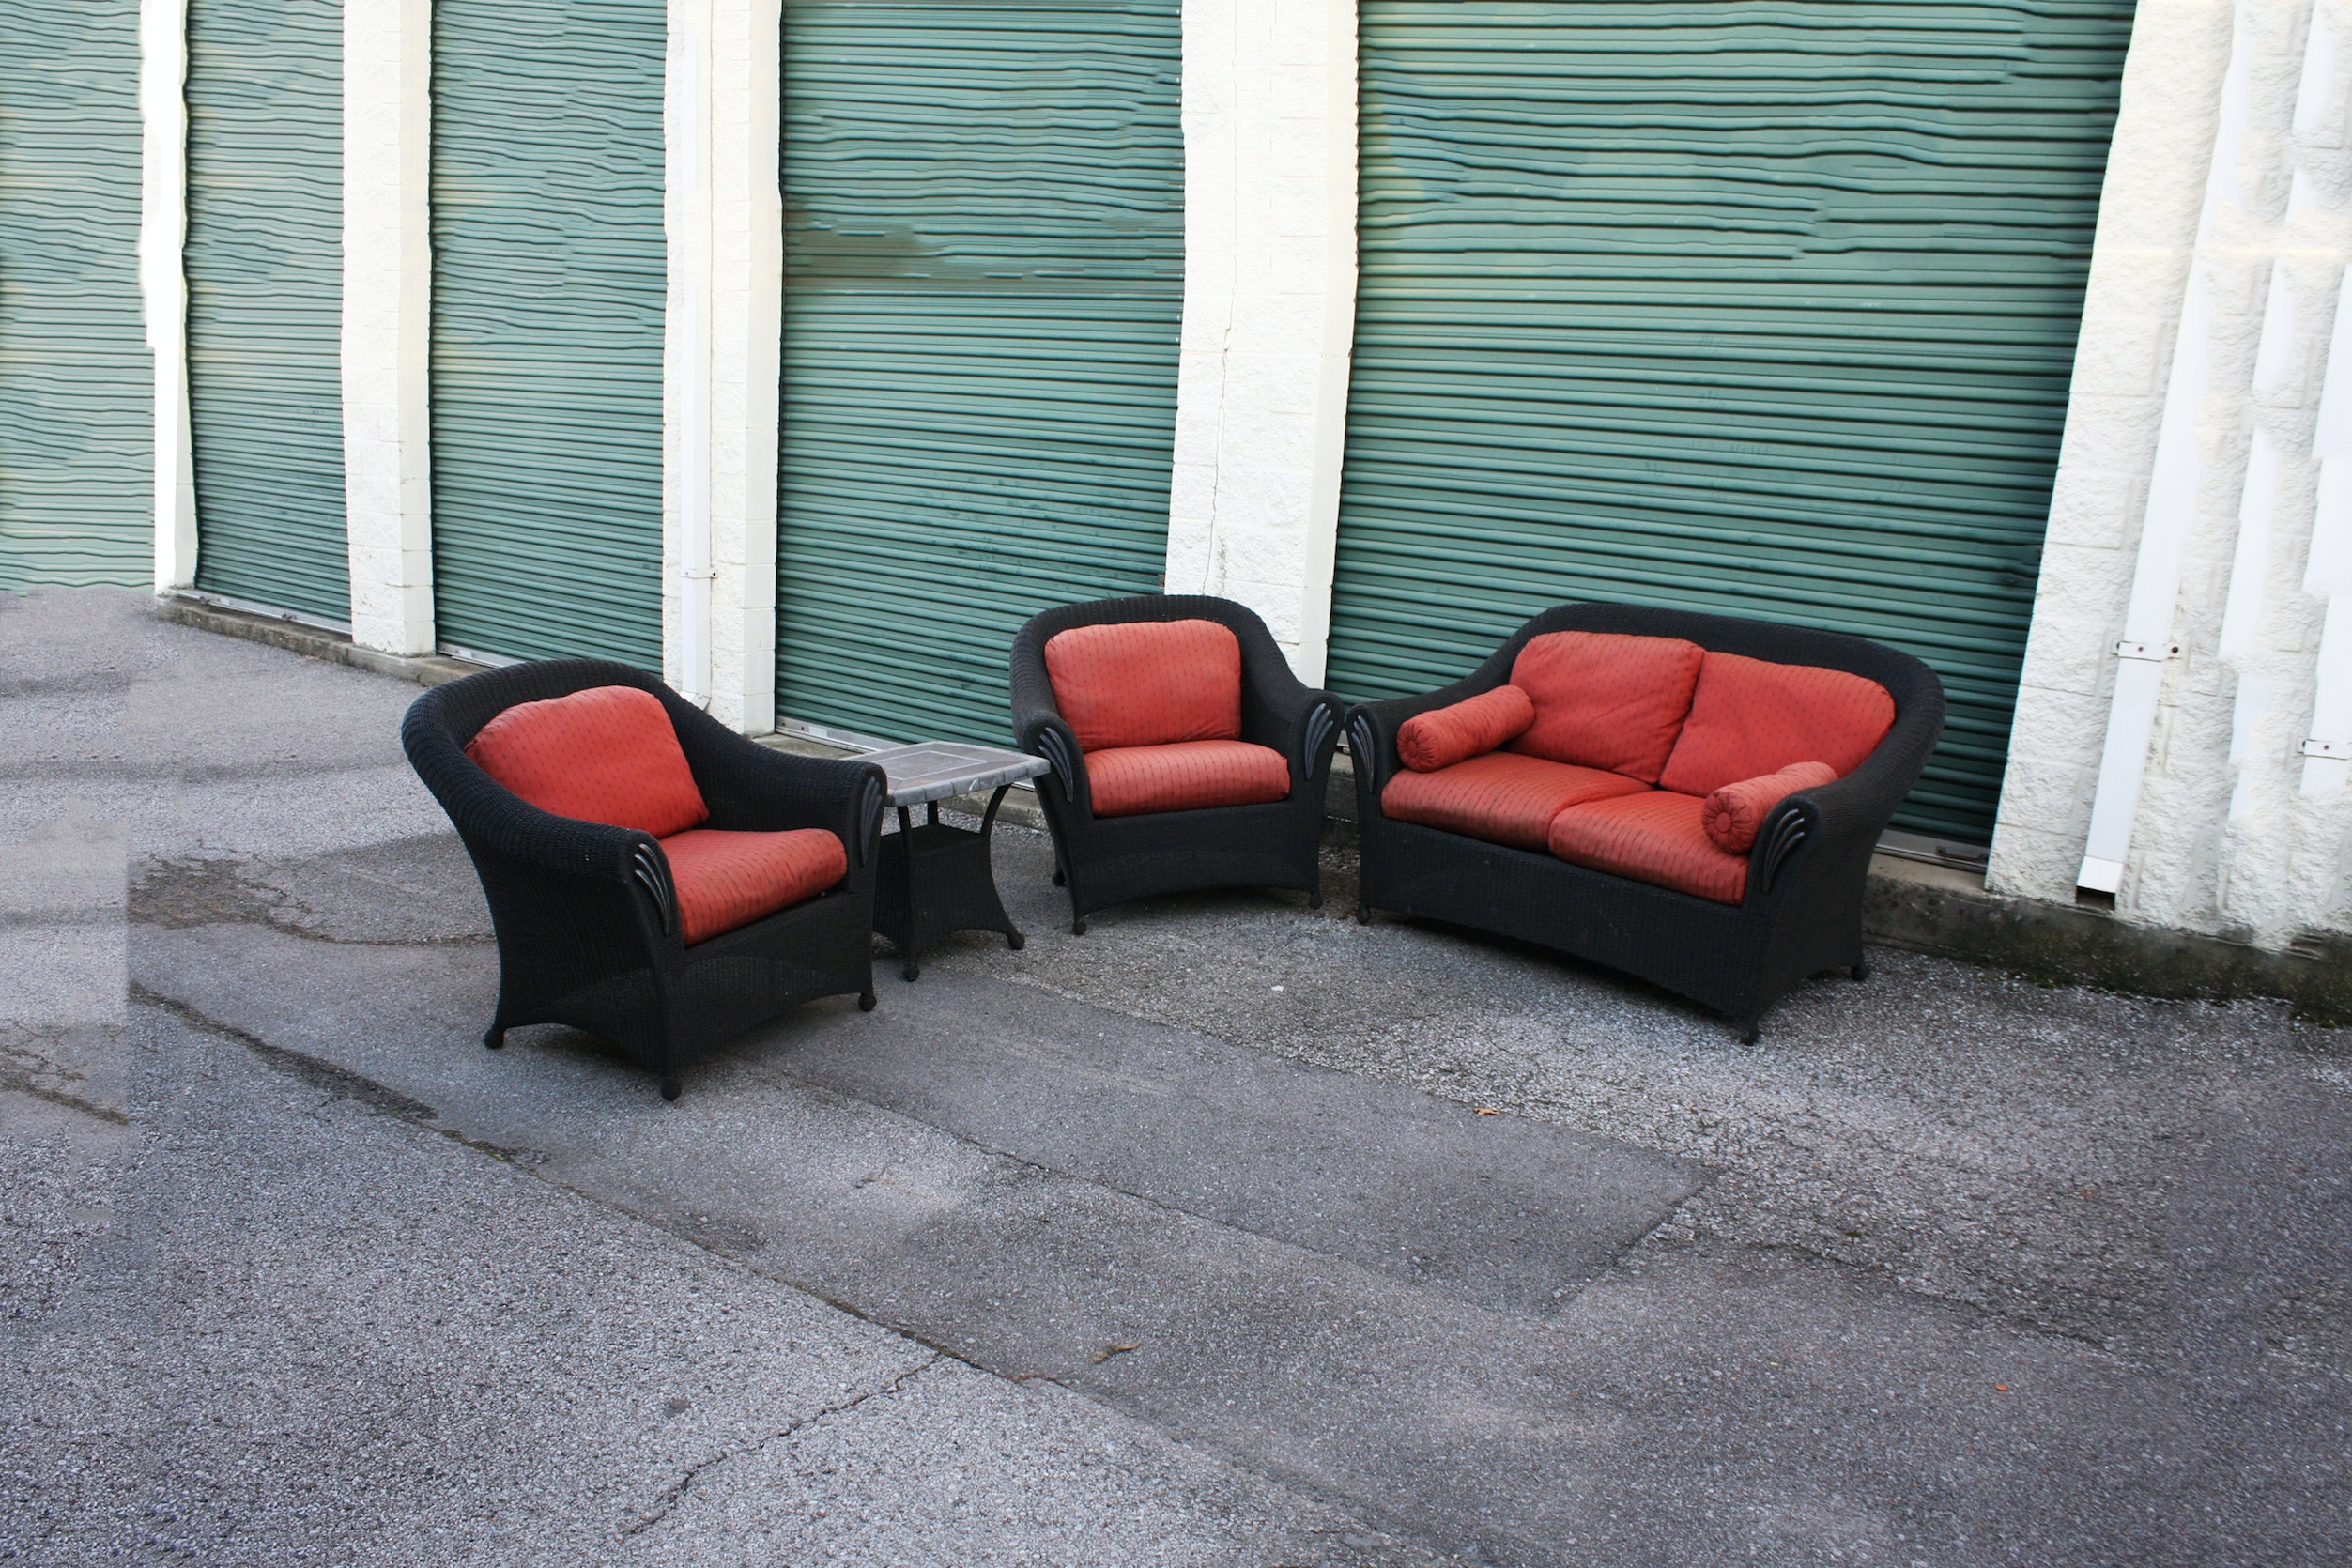 Outdoor Wicker Patio Set